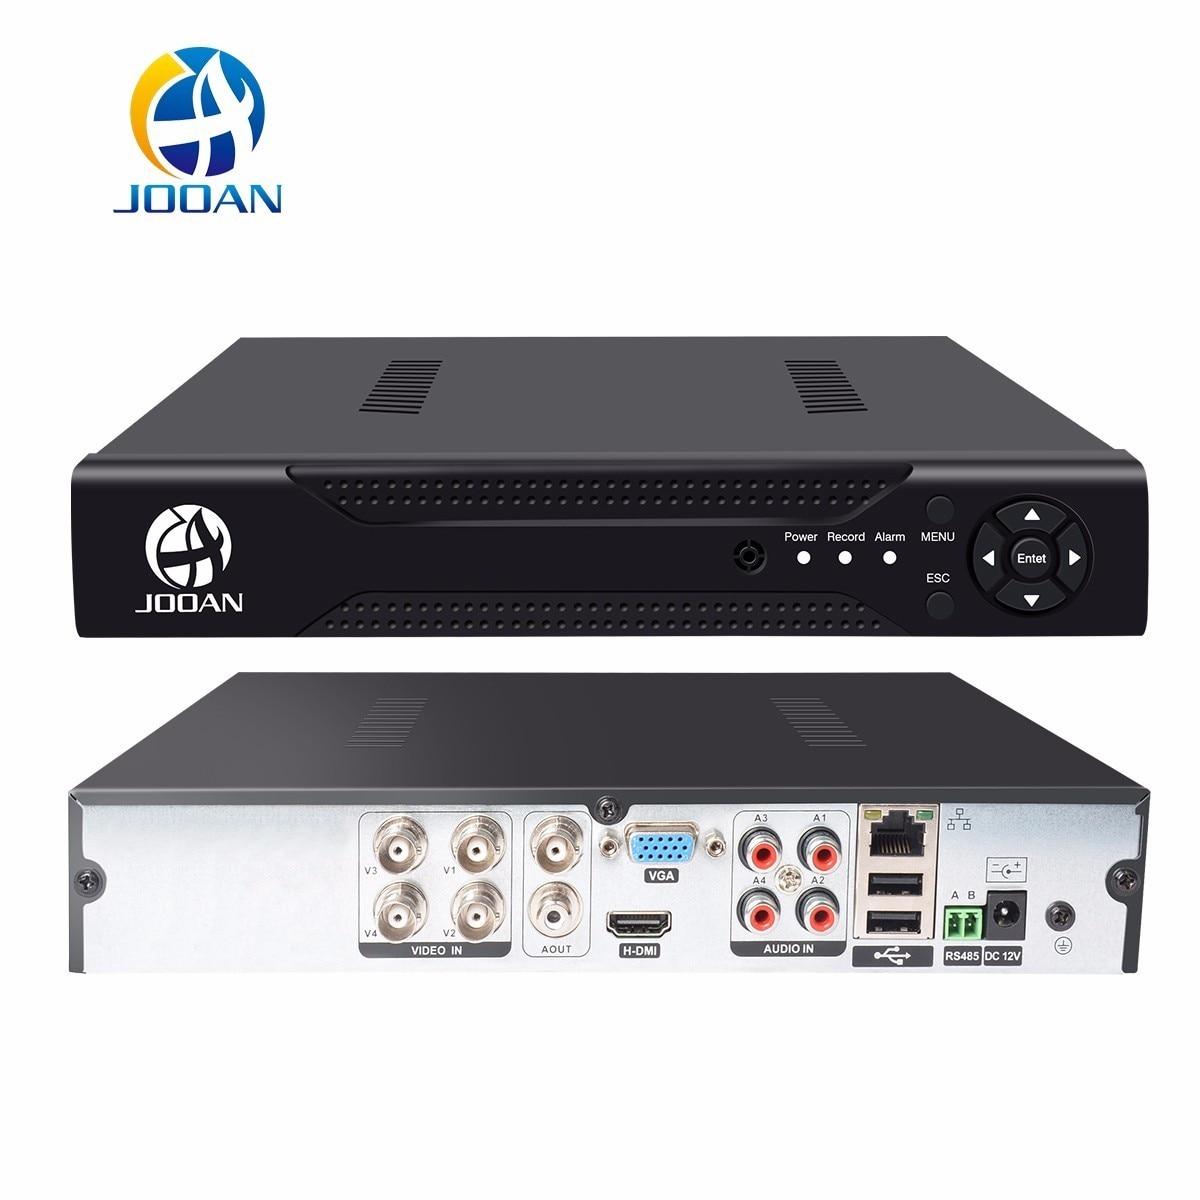 Aliexpress Com Buy Jooan 4ch Cctv Dvr Security System